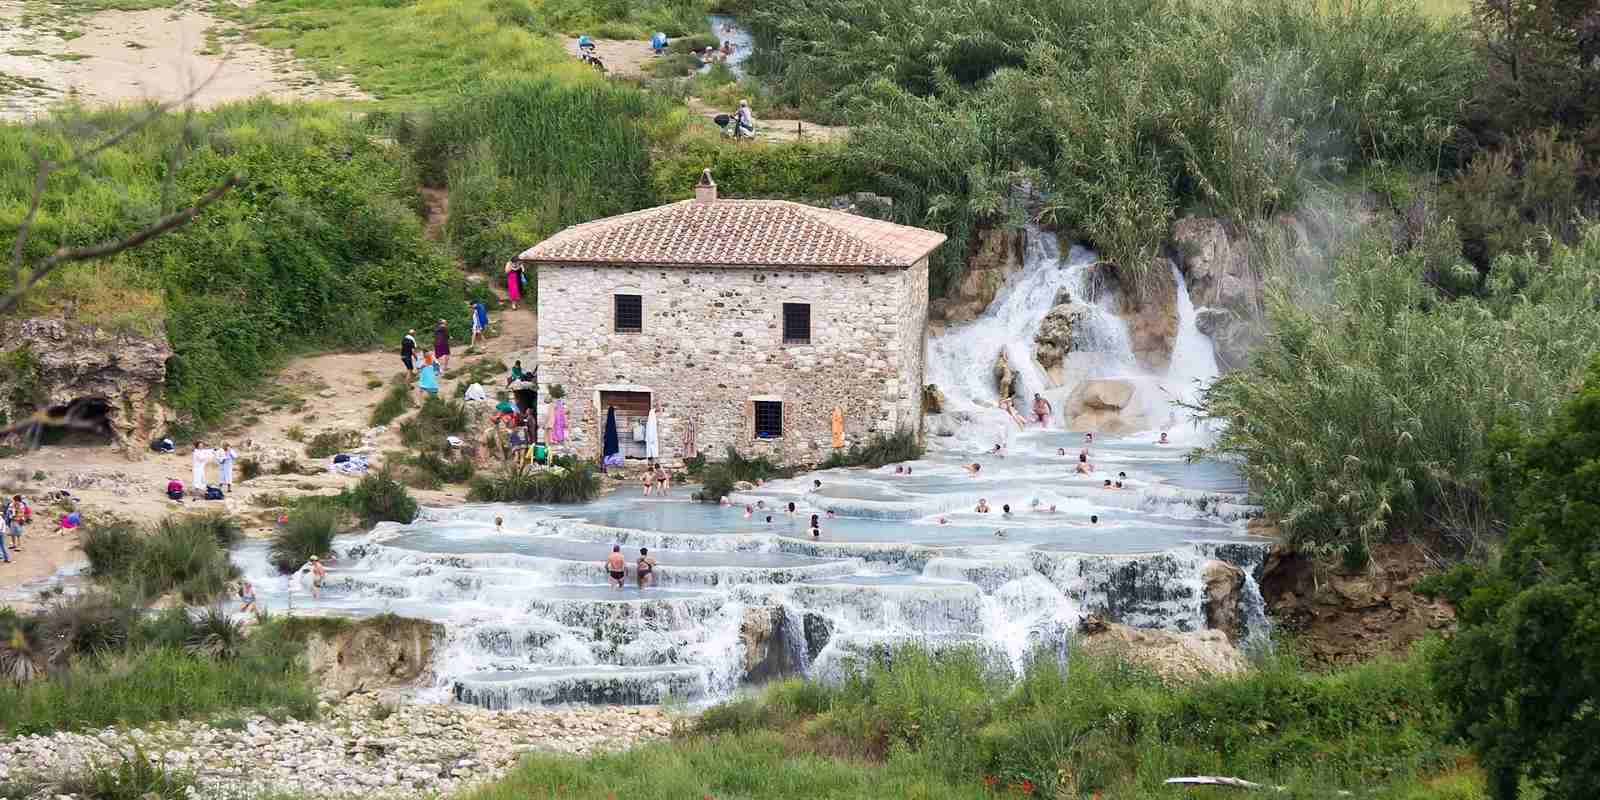 The falls at Terme di Saturnia. (Photo via Wikimedia Commons)